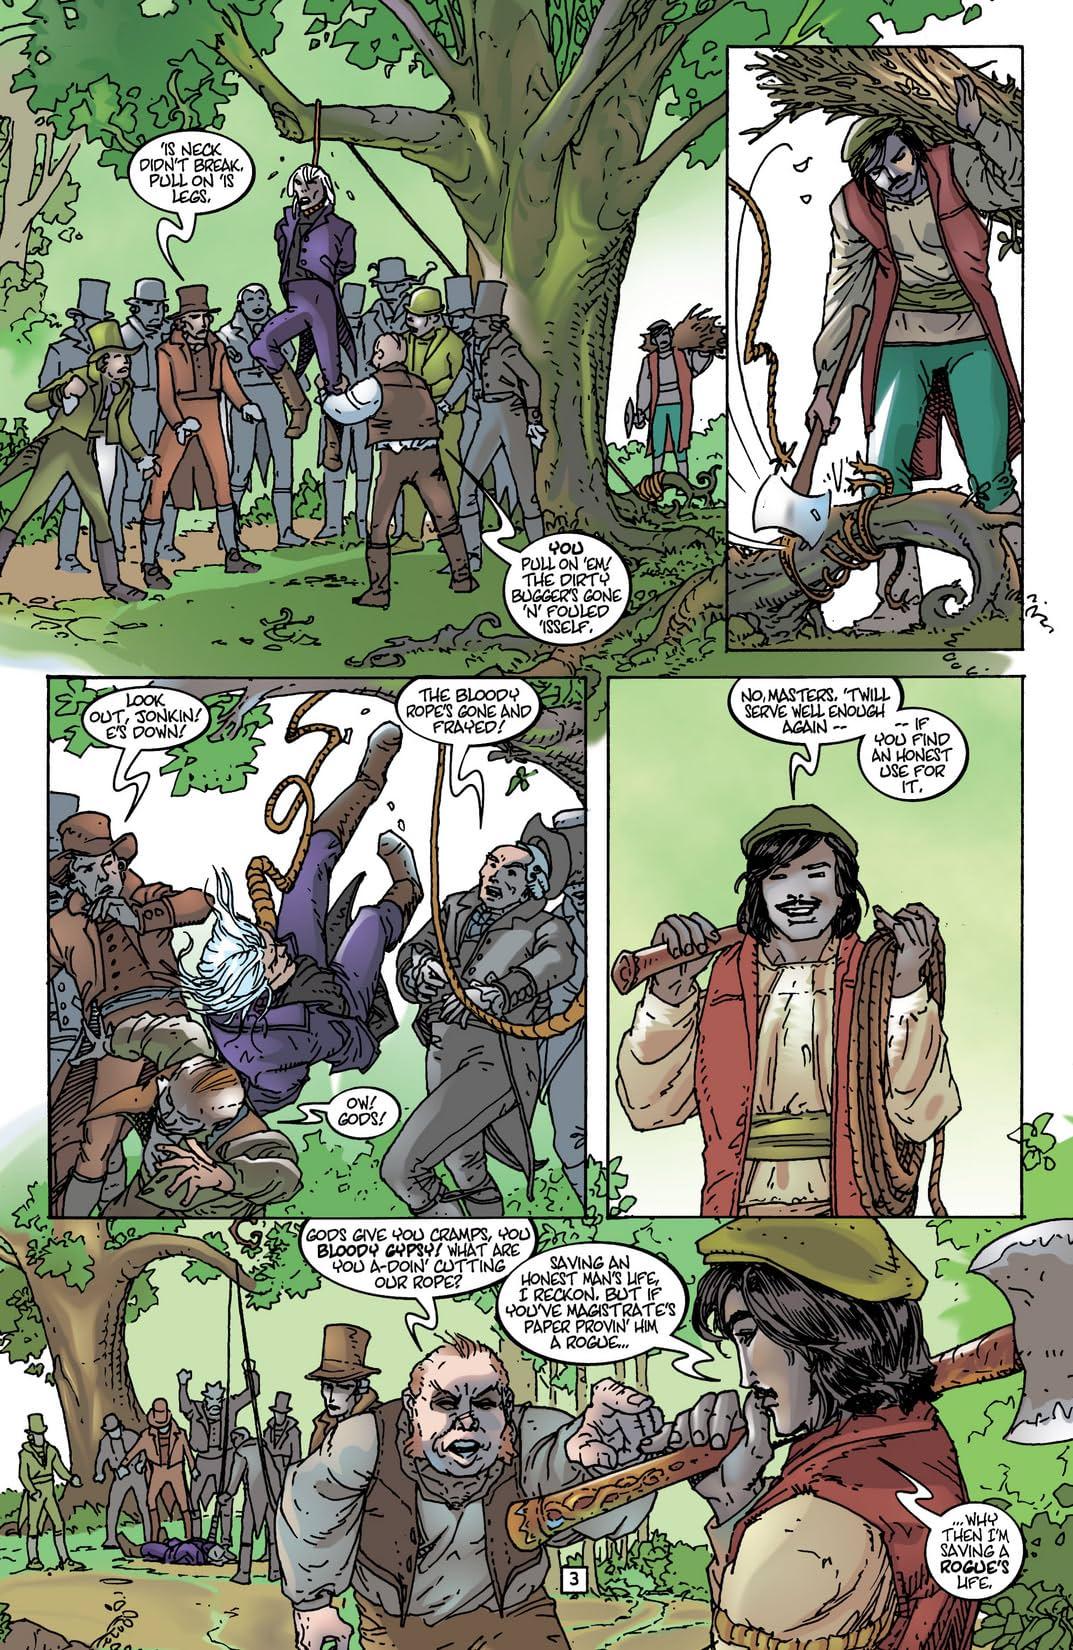 The Sandman Presents: Petrefax #2 (of 4)